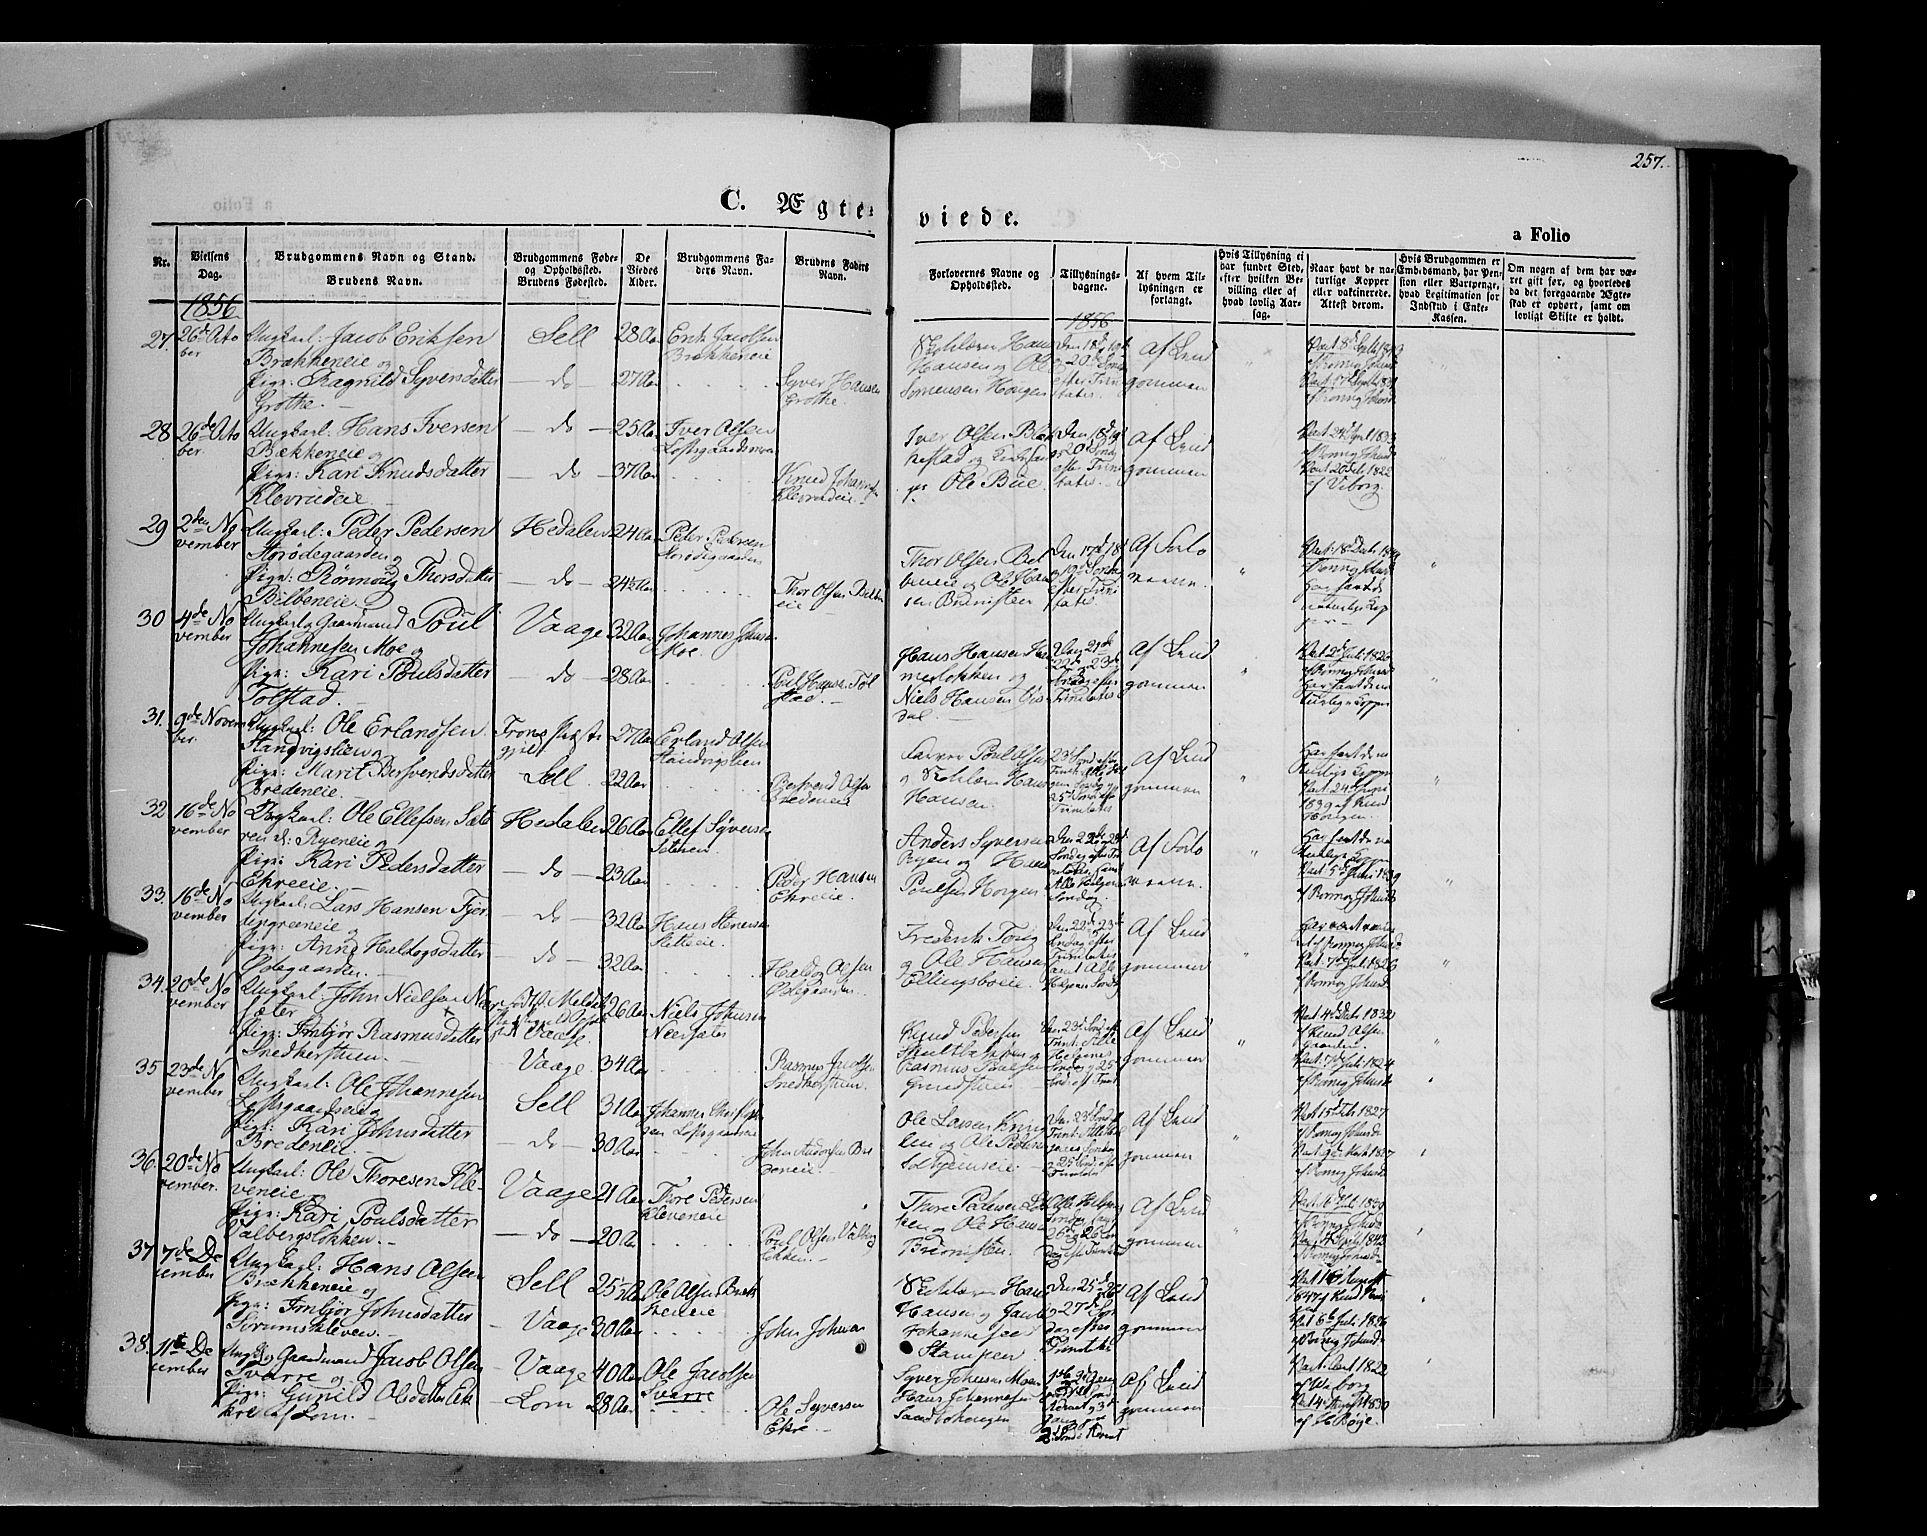 SAH, Vågå prestekontor, Ministerialbok nr. 6 /1, 1856-1872, s. 257